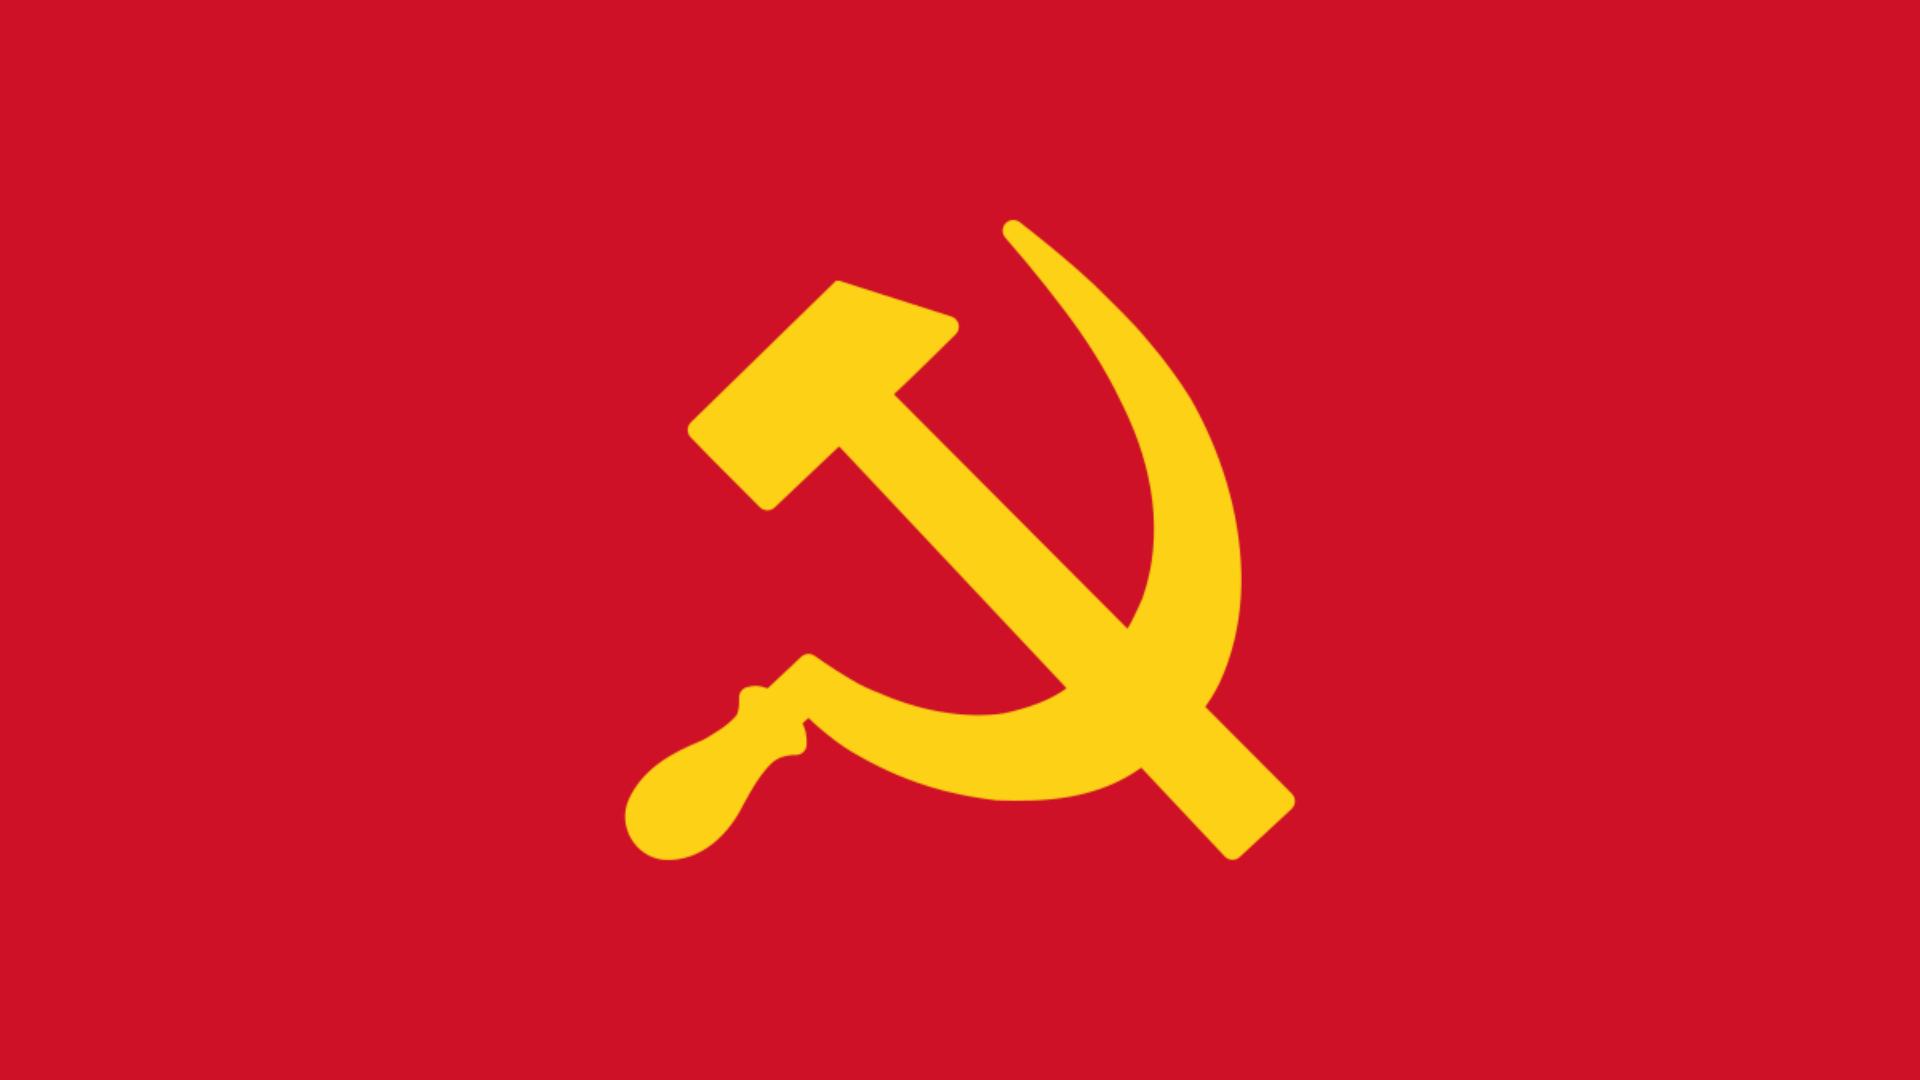 I love communism!, por Reuben Morales